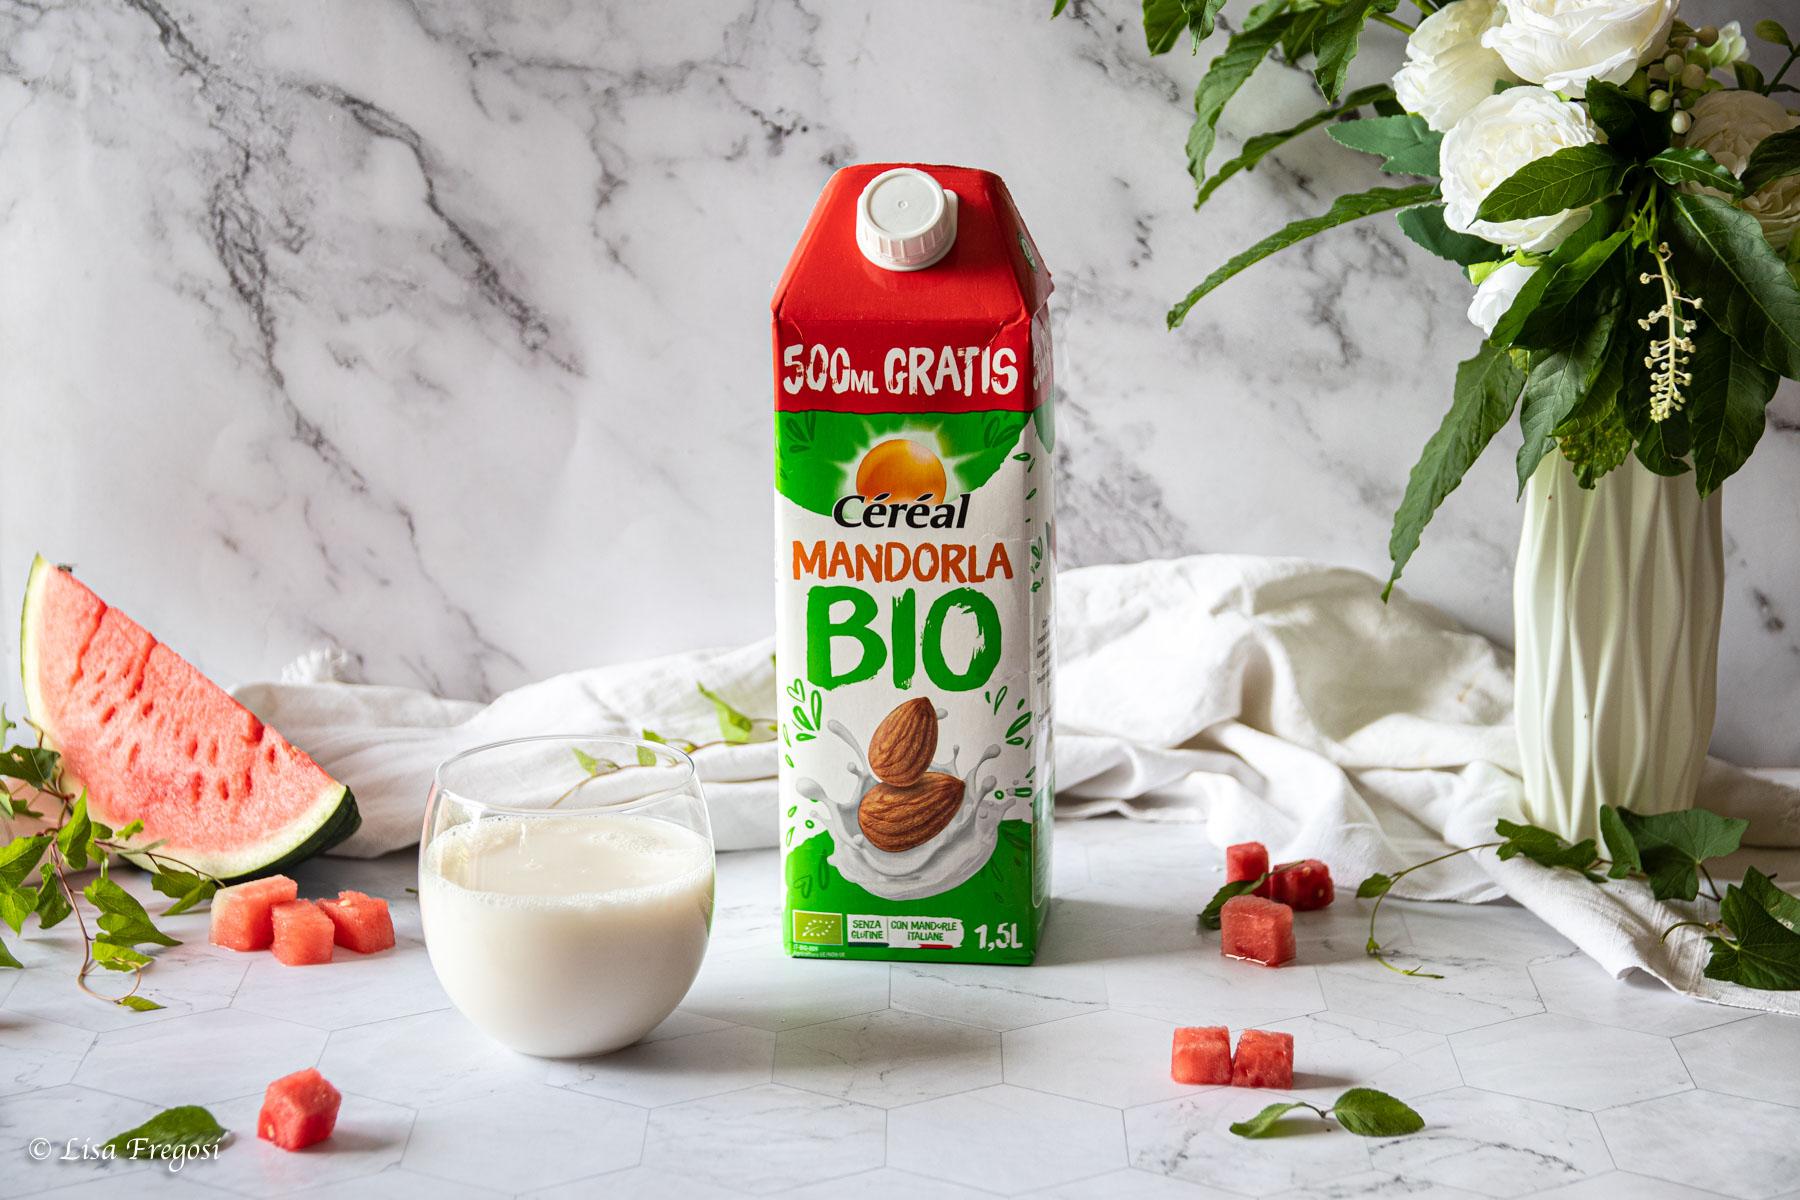 Il latte alle mandorle bio Céréal, ricette in cui utilizzarlo